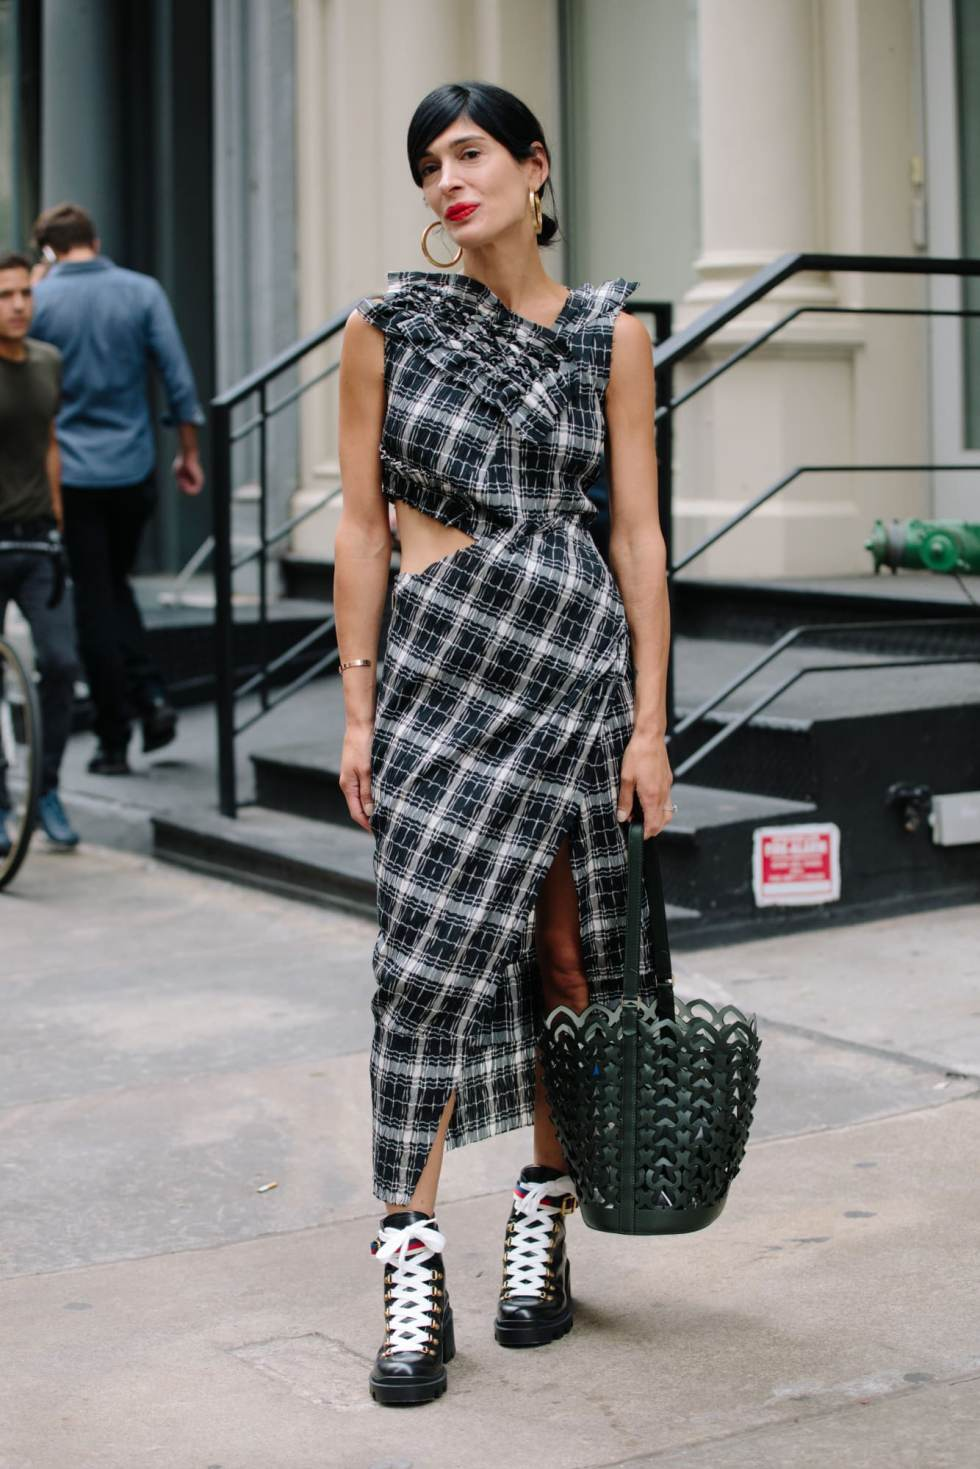 new-york-fashion-week-street-style-spring-2019-day-2-14